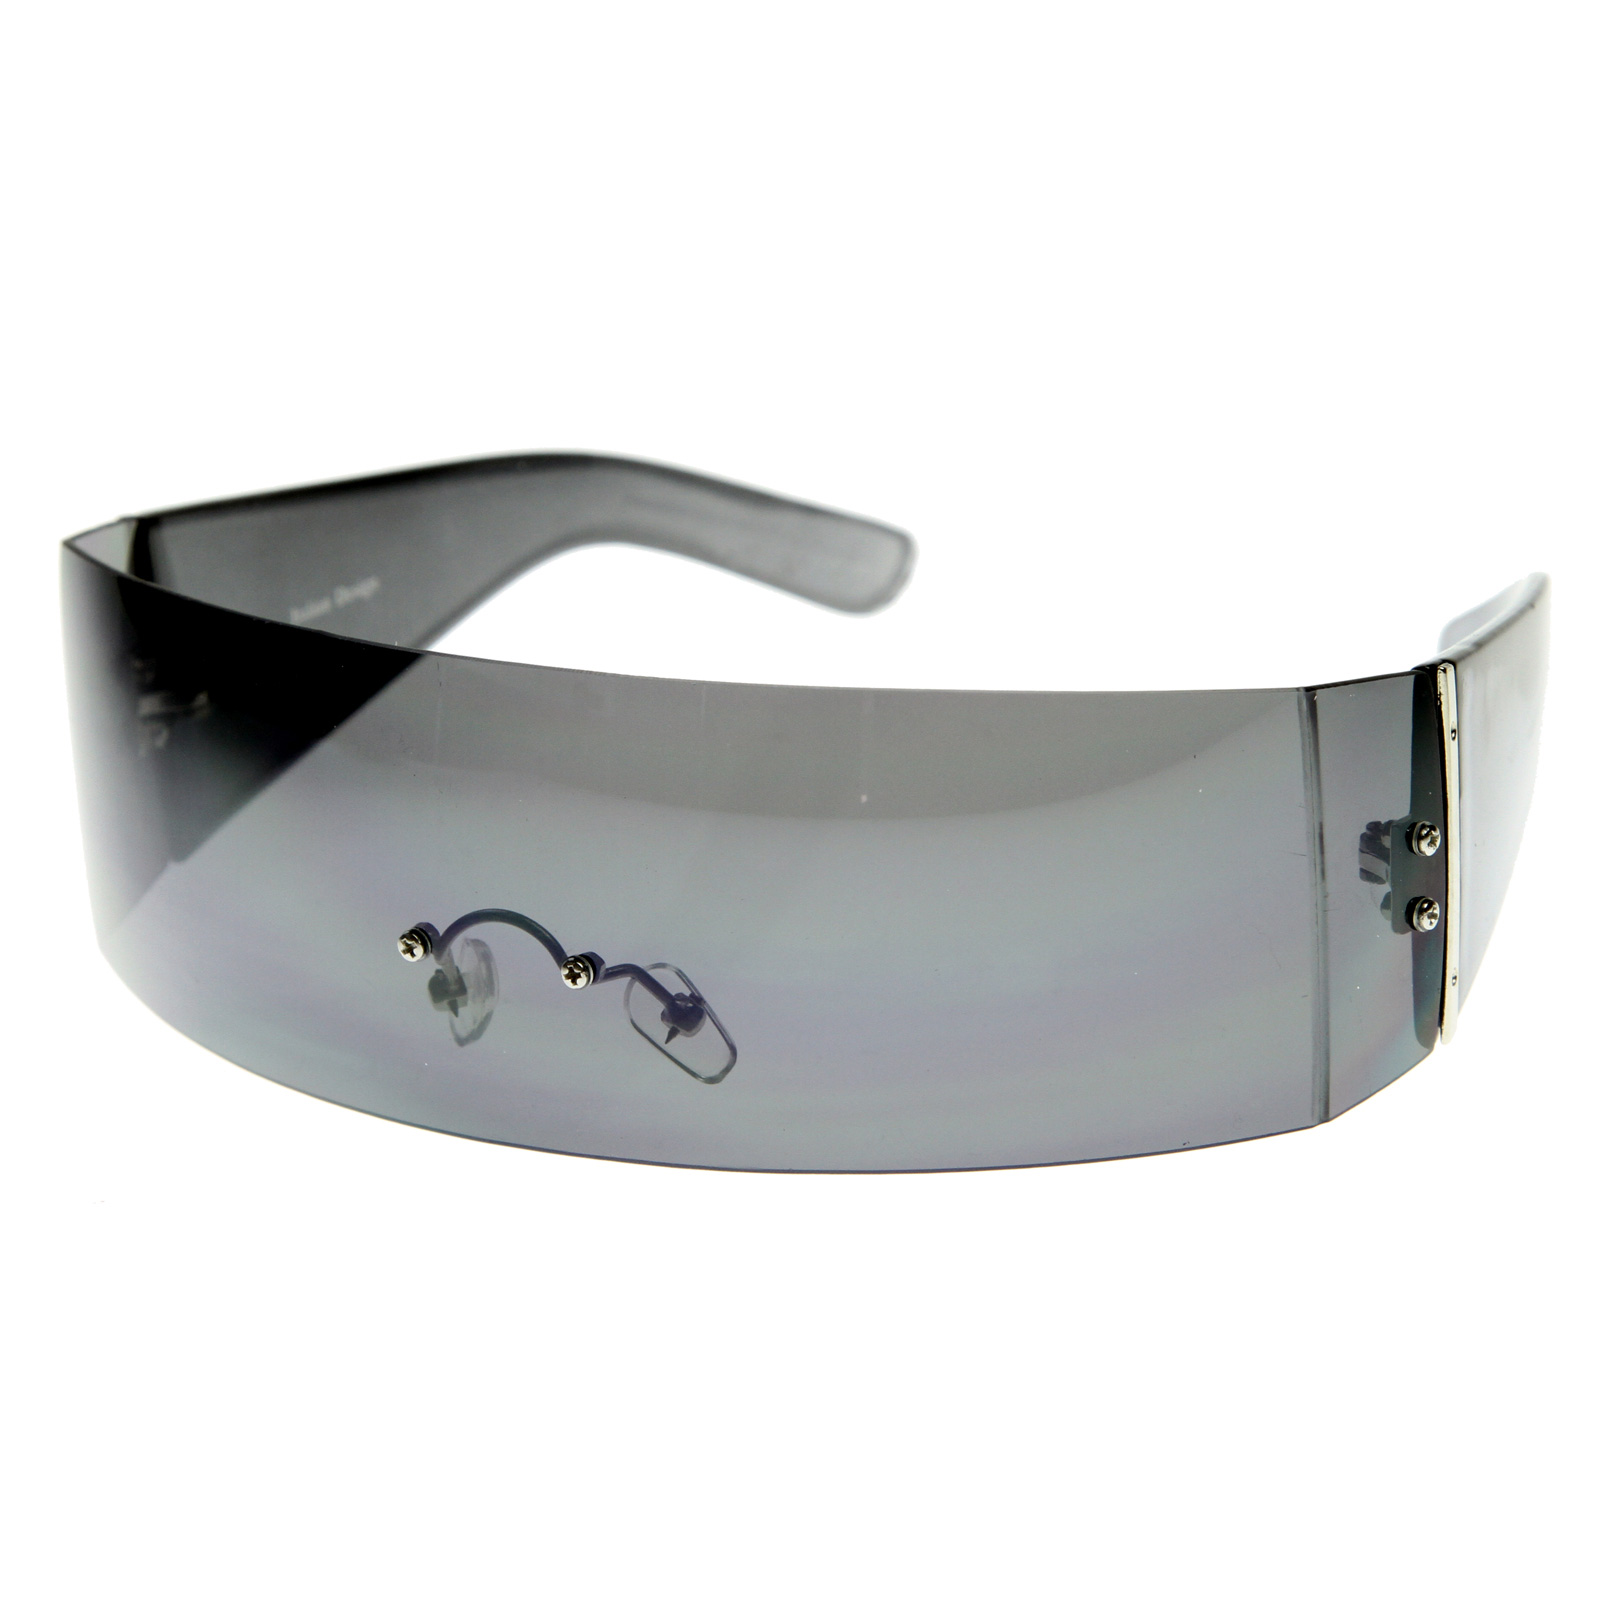 Future-Designer-Monoblock-Curved-Full-Shield-New-York-Fashion-Sunglasses-8502